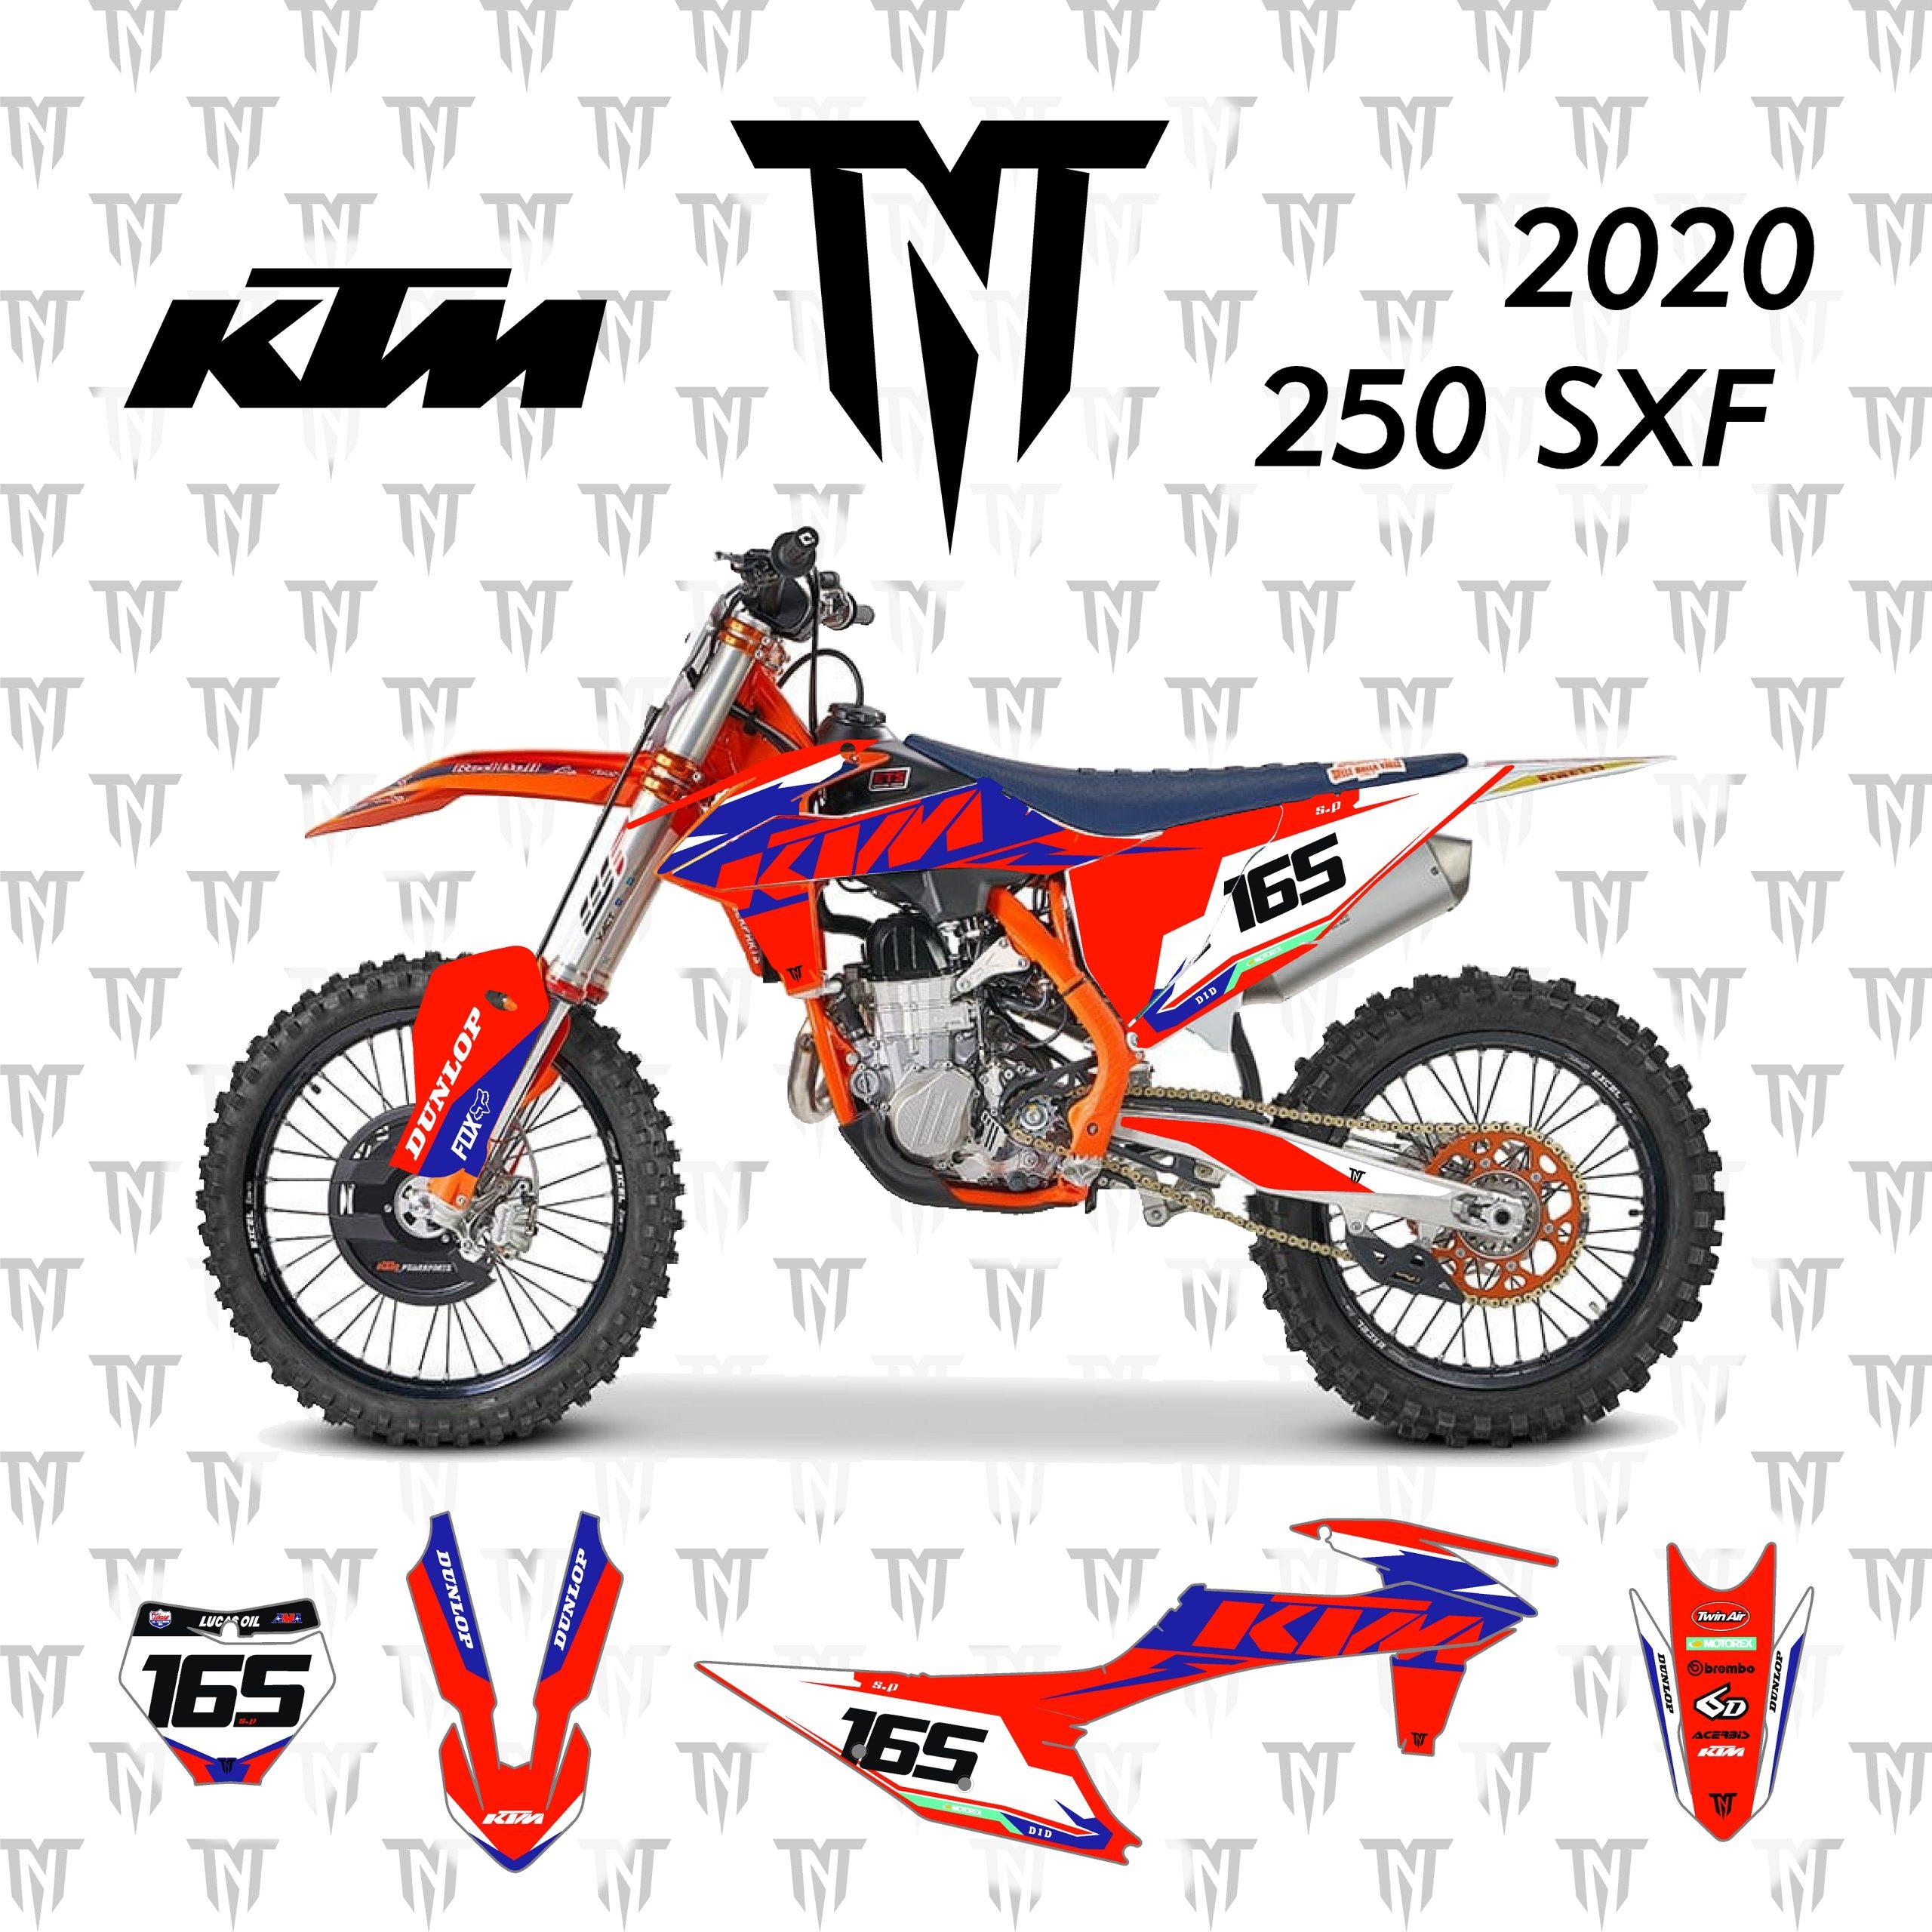 2020 KTM 250 SXF